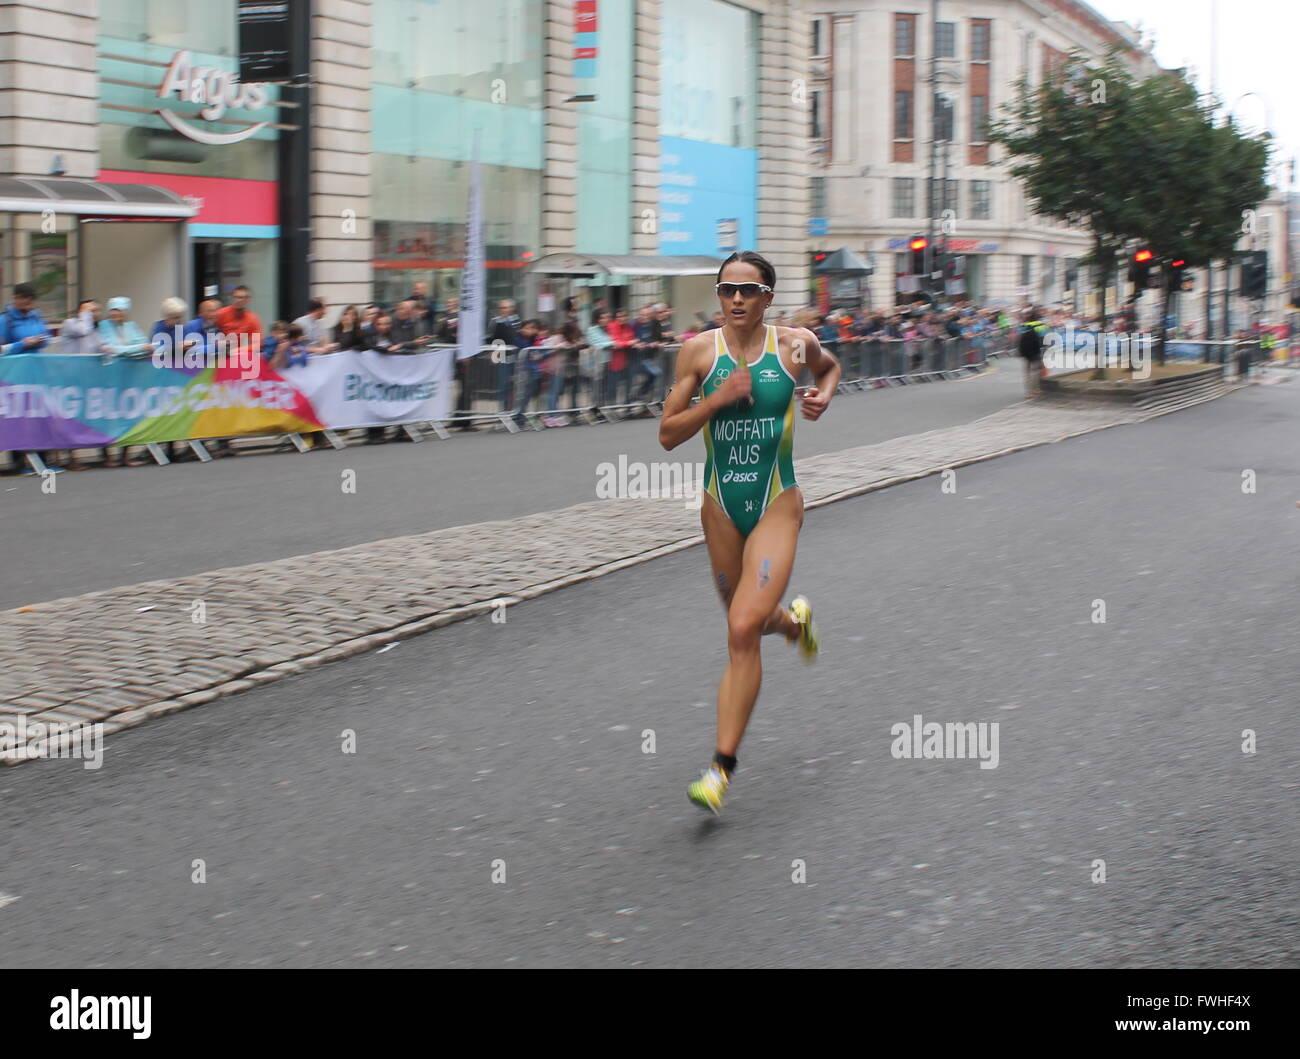 ITU Triathlon World Series - Donne Elite - Leeds Immagini Stock